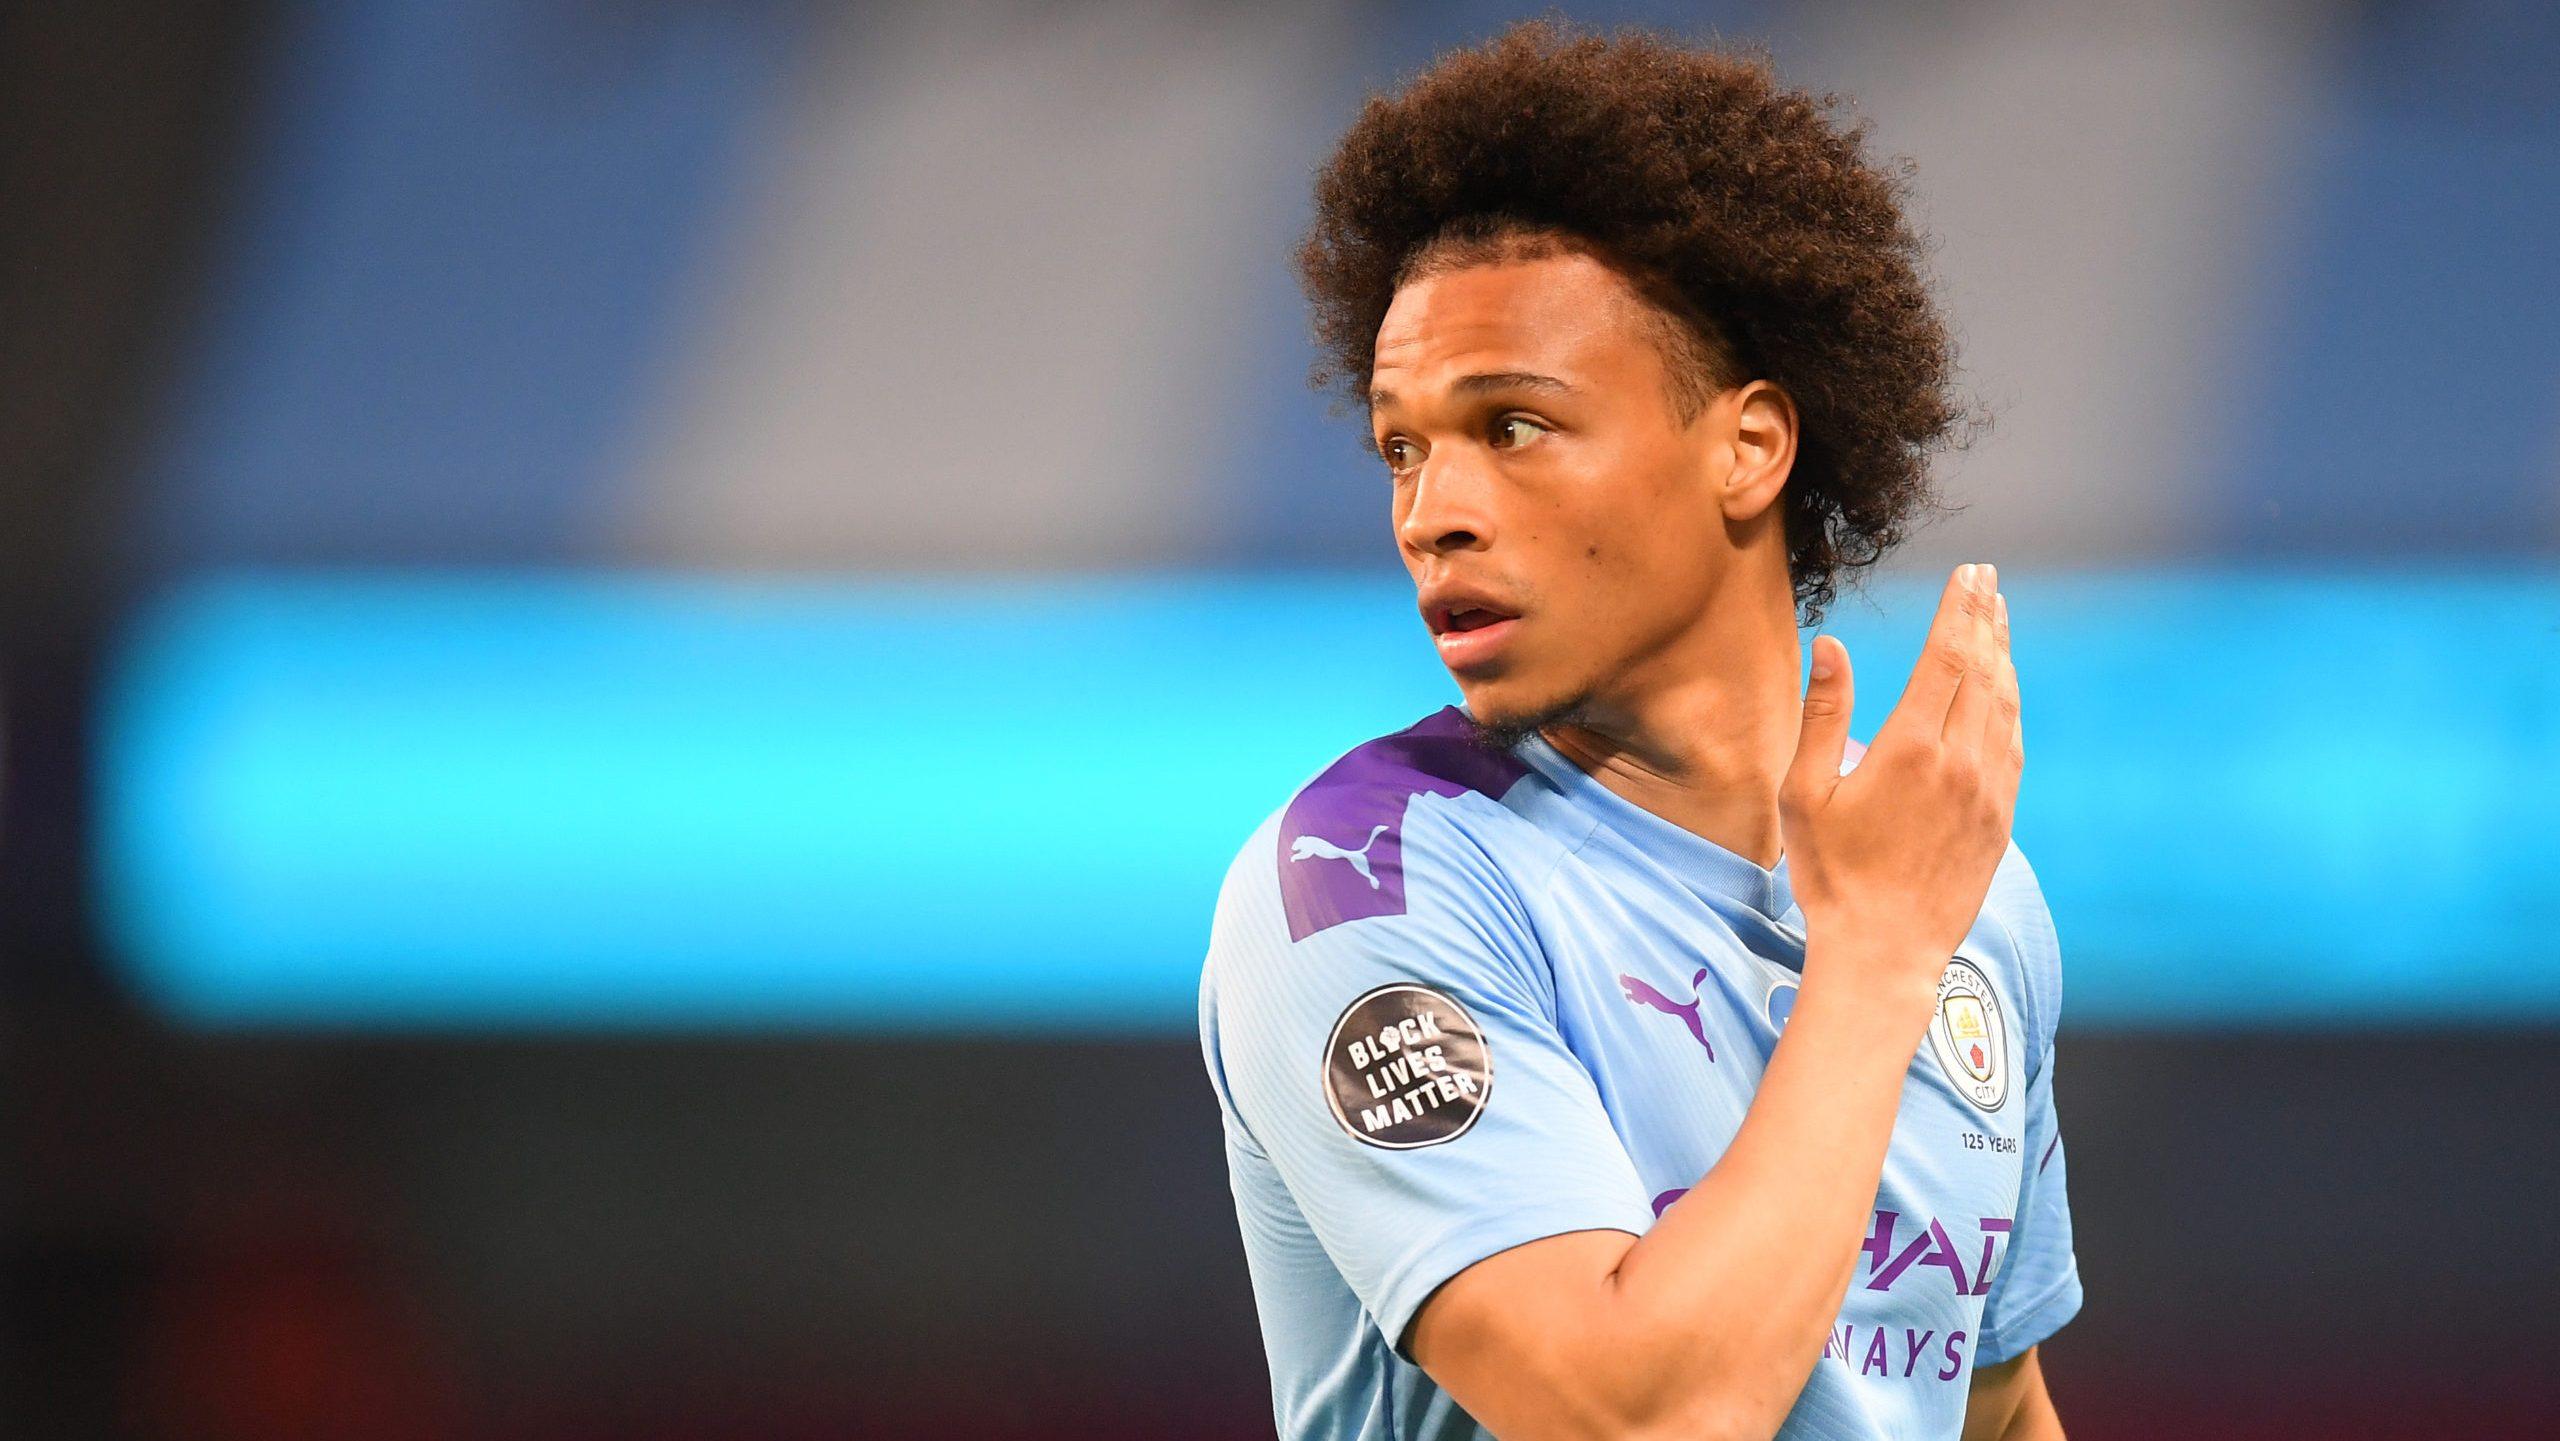 Bayern-Starneuzugang Leroy Sane: Der Dribbler